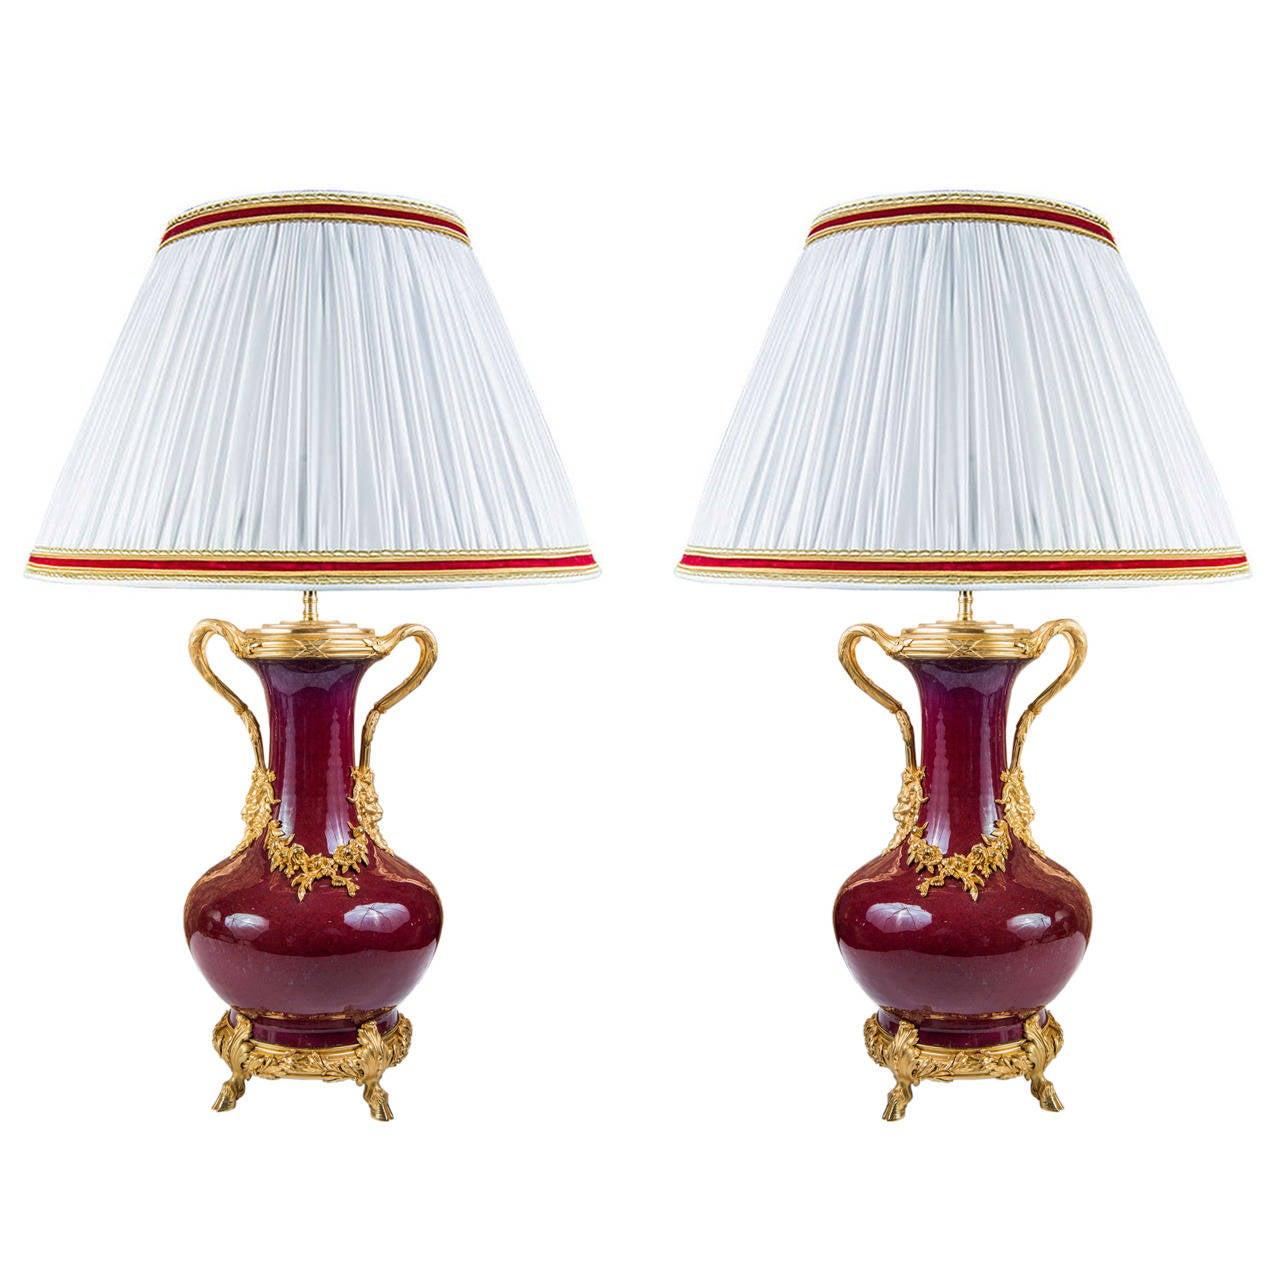 "Very Rare Pair of ""Sang De Boeuf"" Table Lamps"